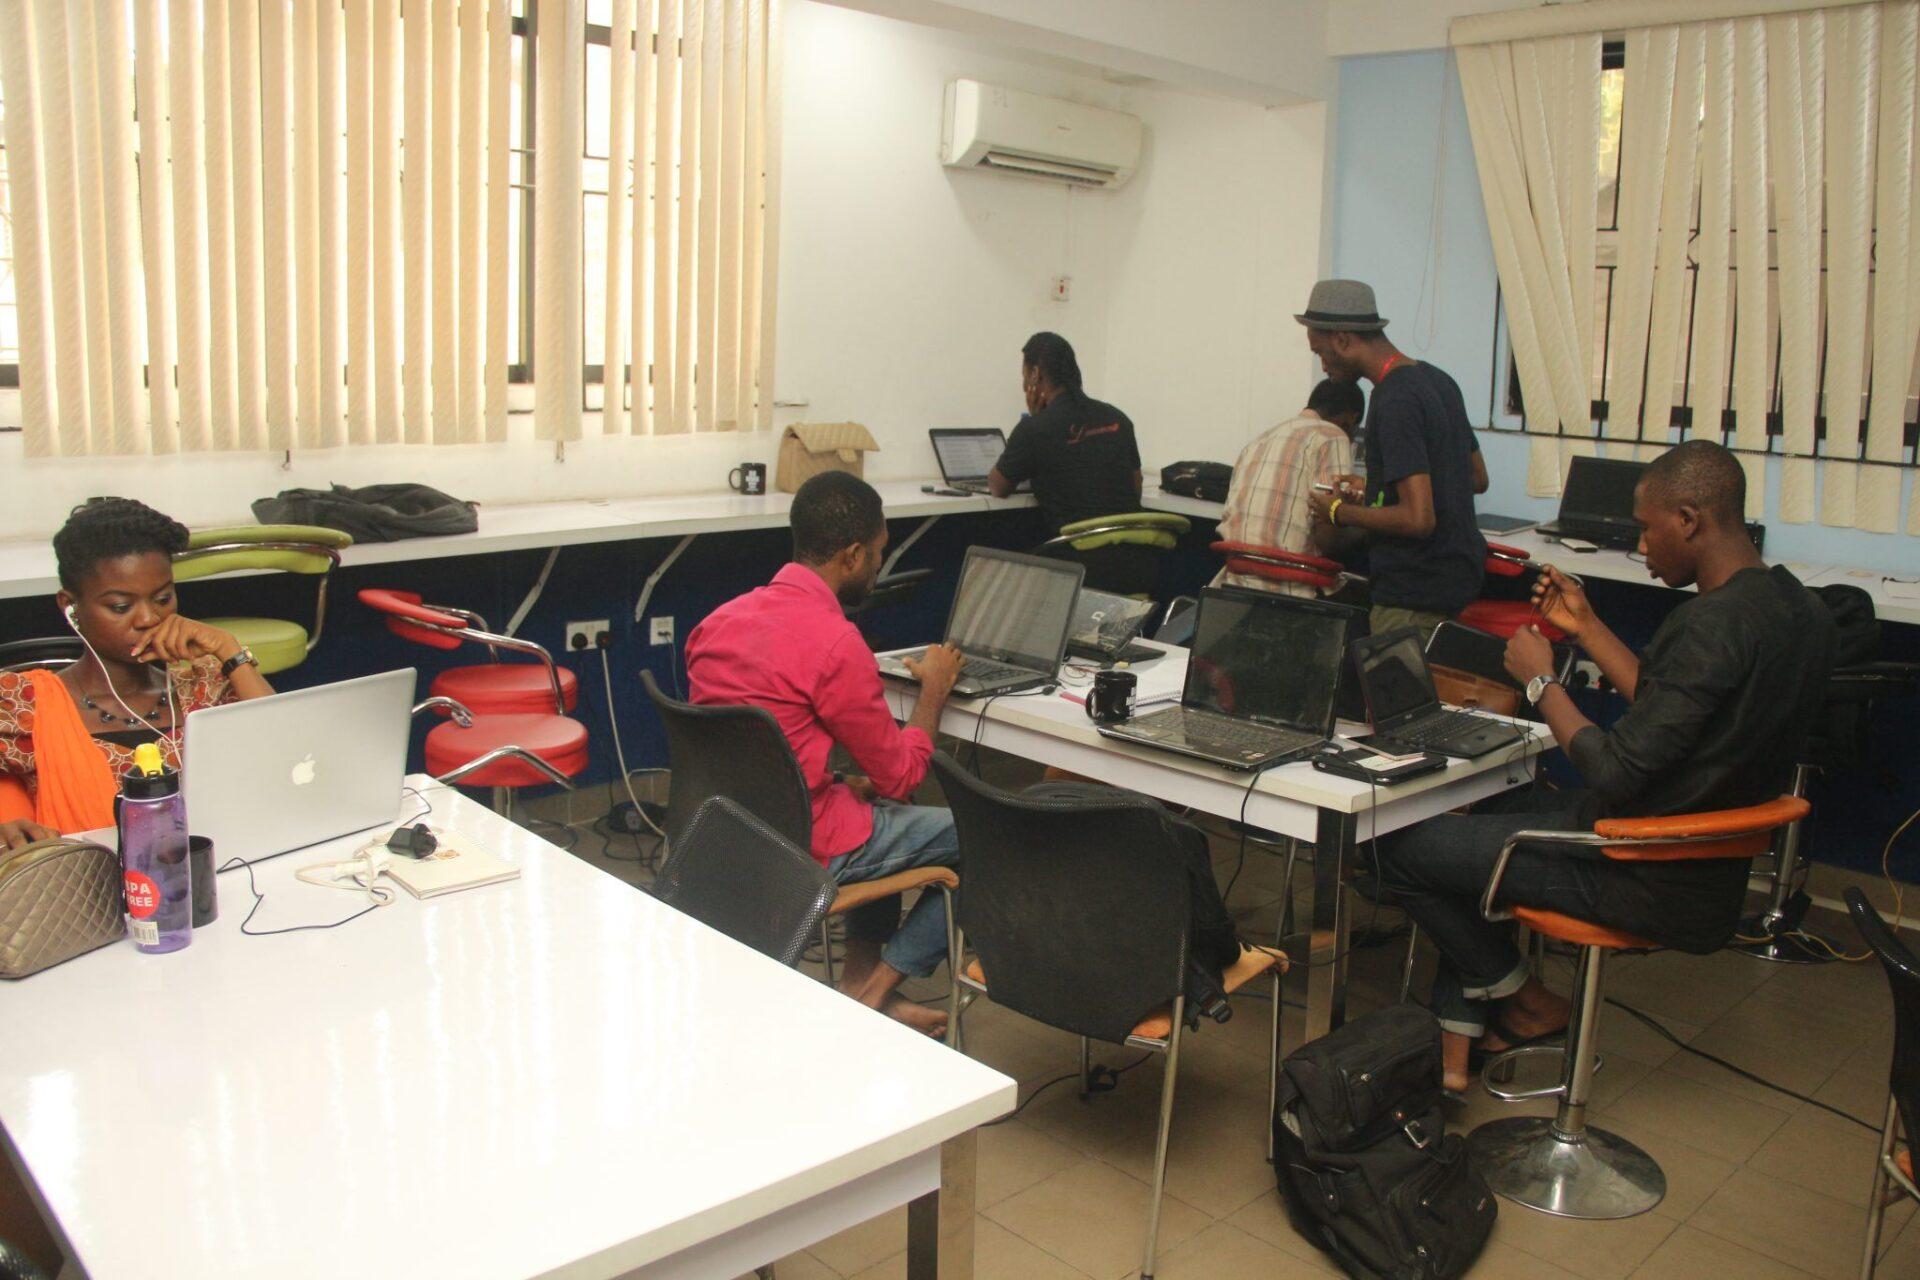 N-Power, government job creation scheme, to empower software developers